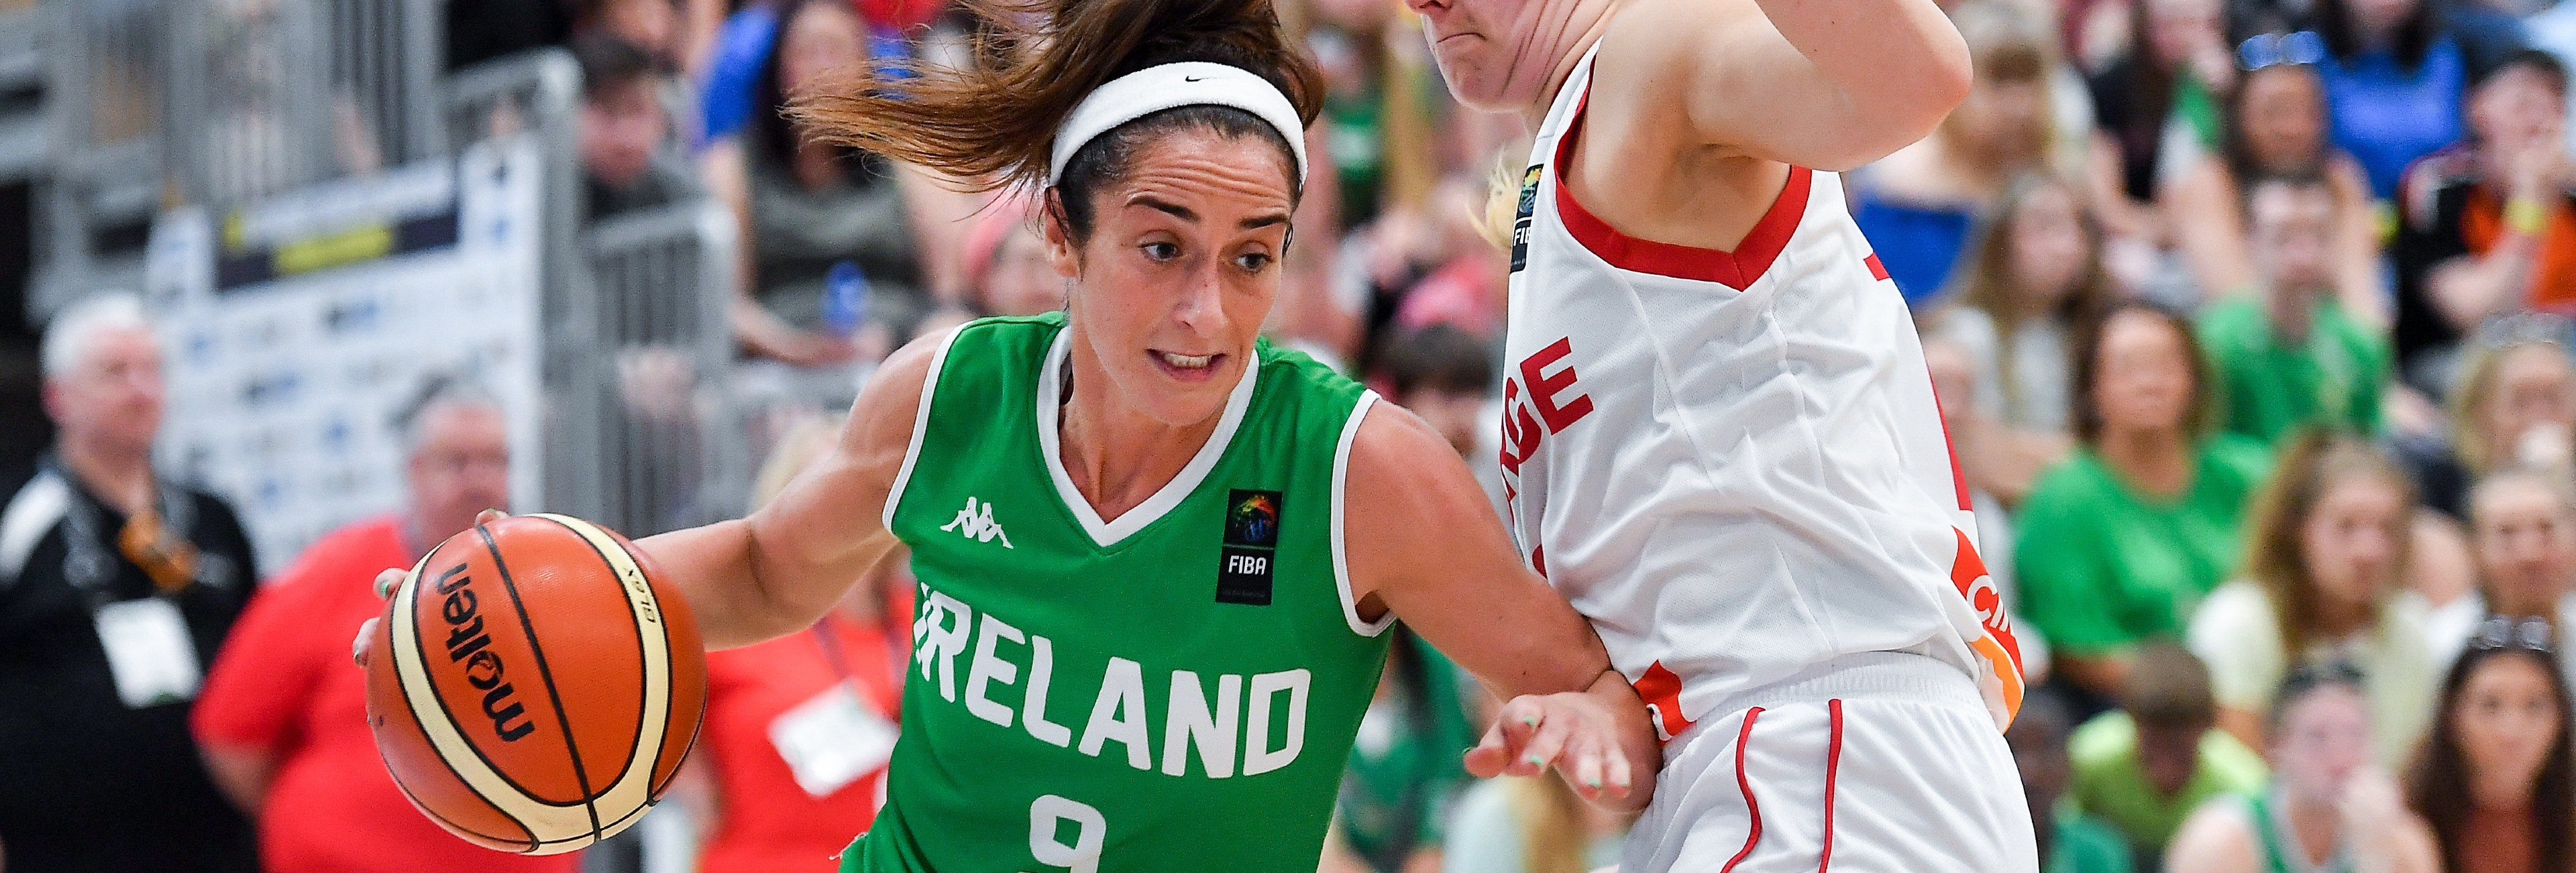 ireland-basketball-subfooter